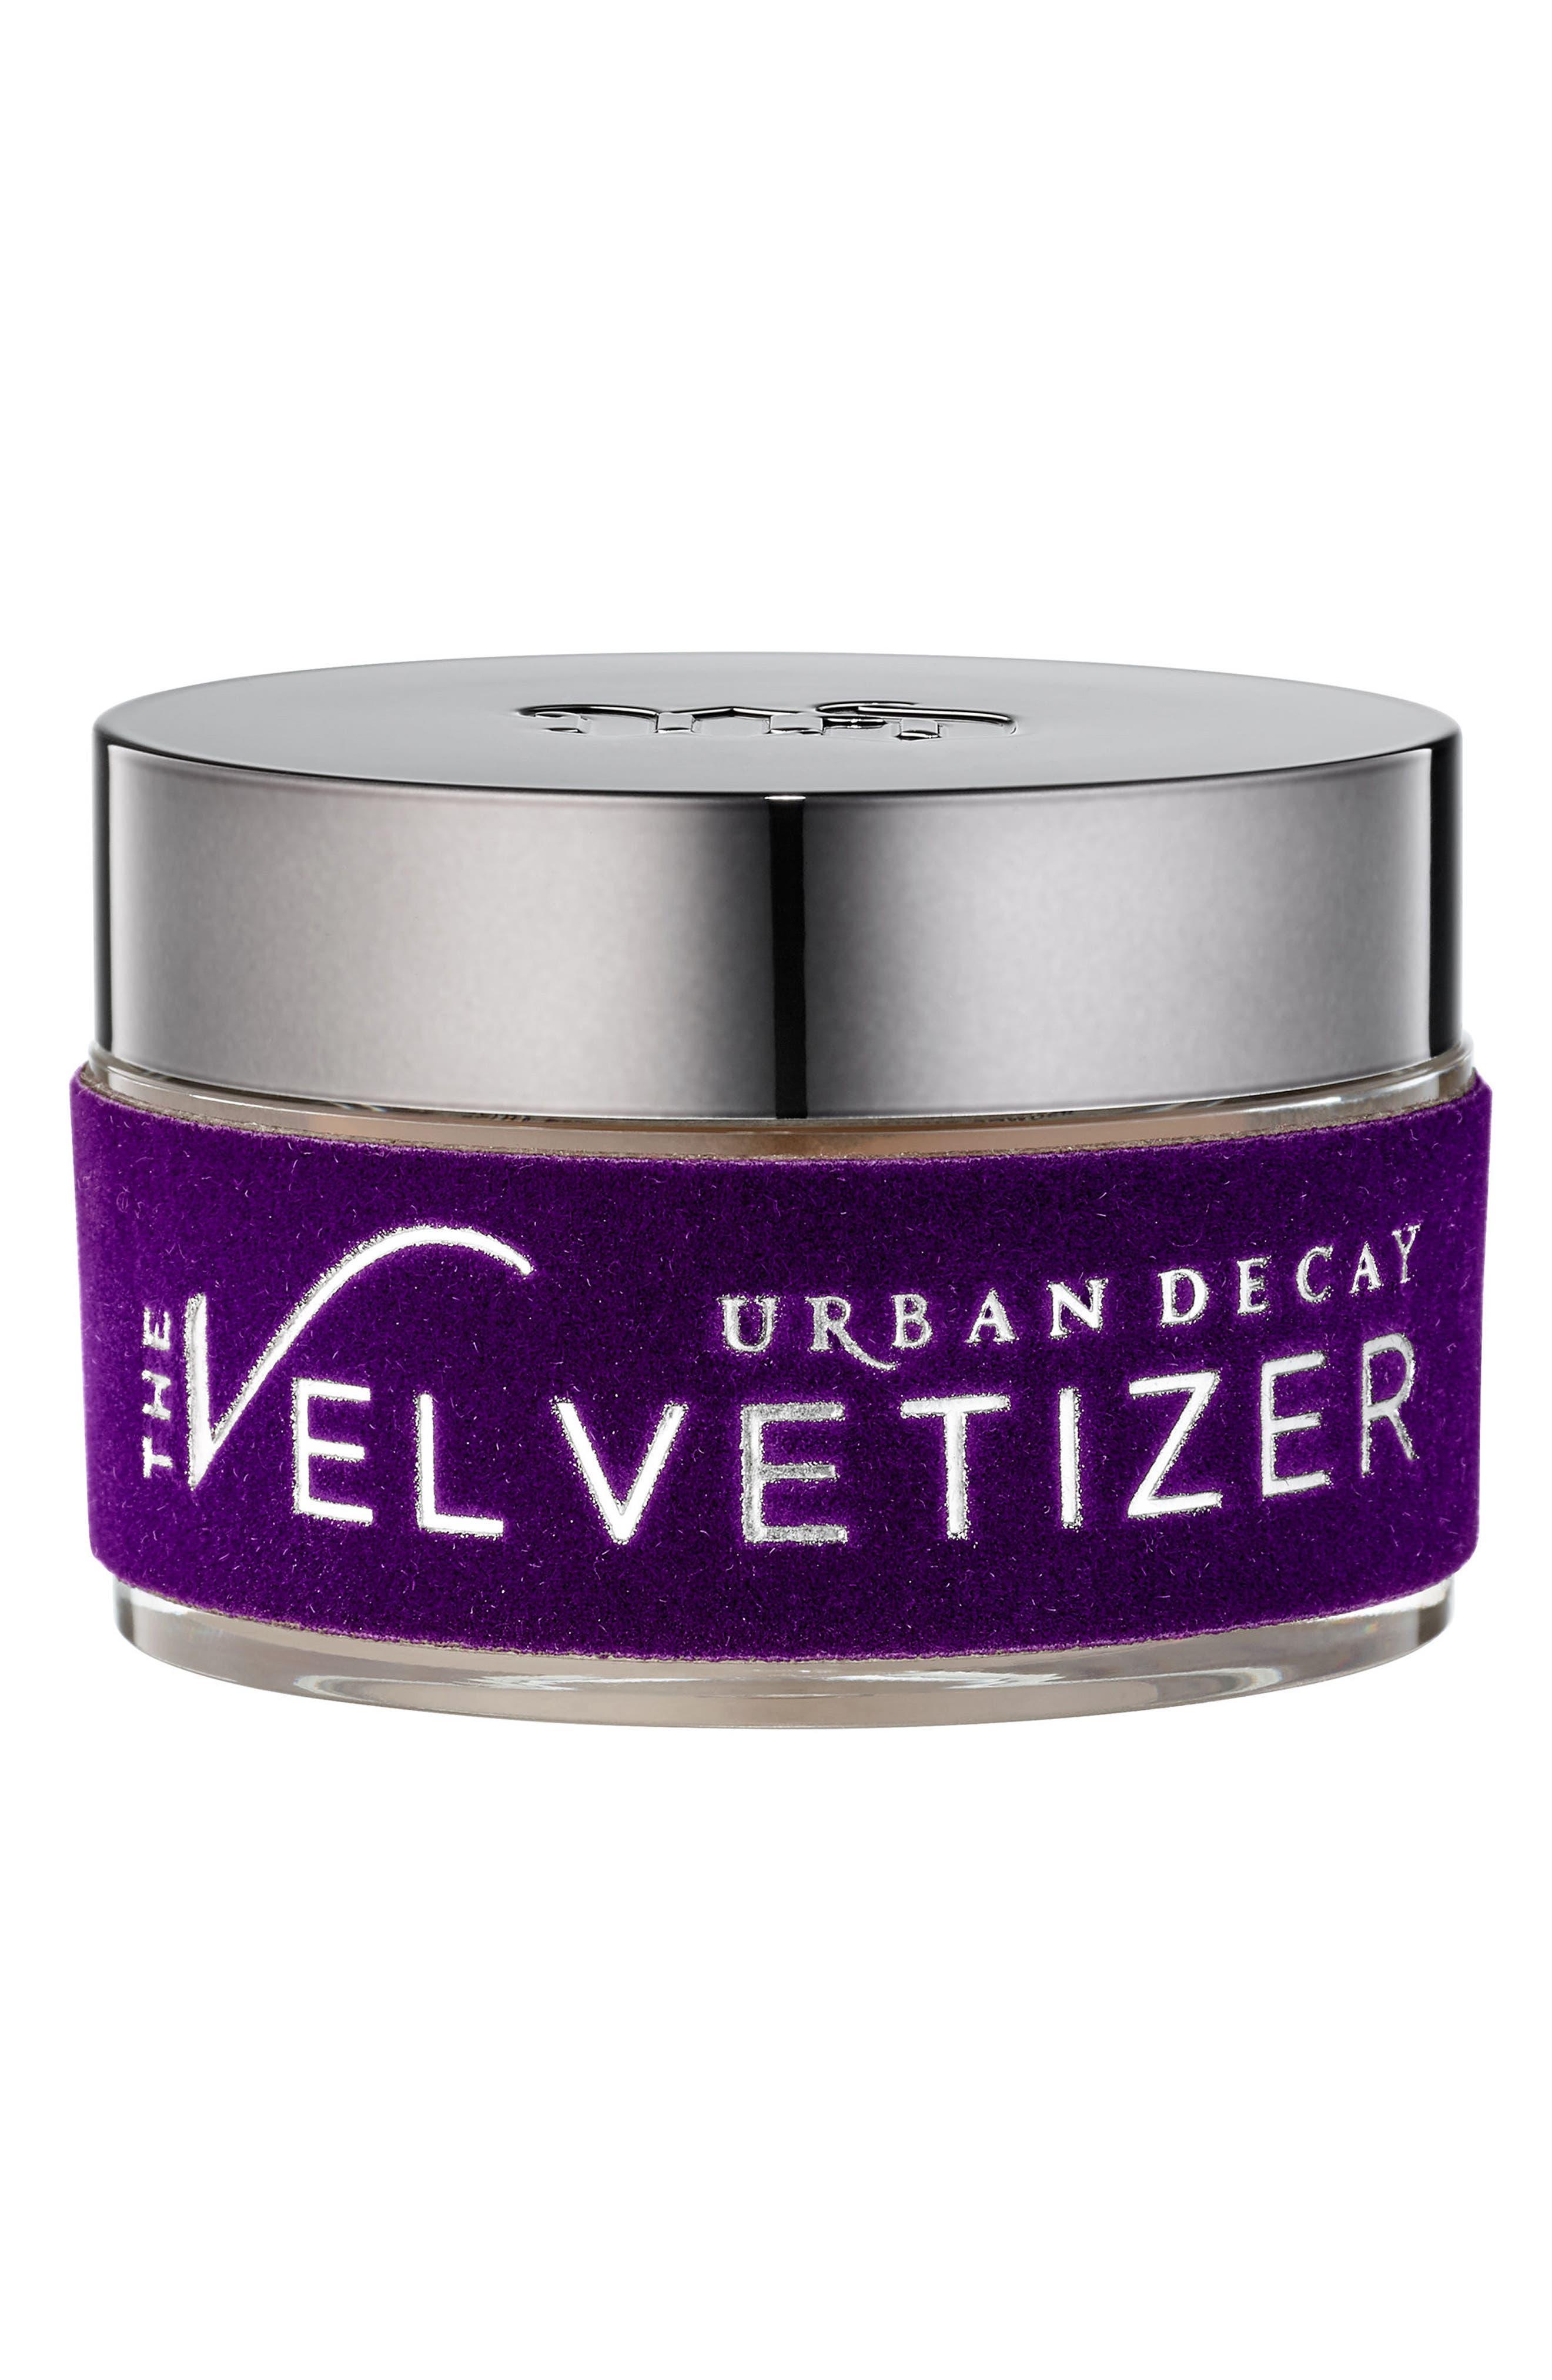 Image of Urban Decay The Velvetizer Translucent Mix-In Medium